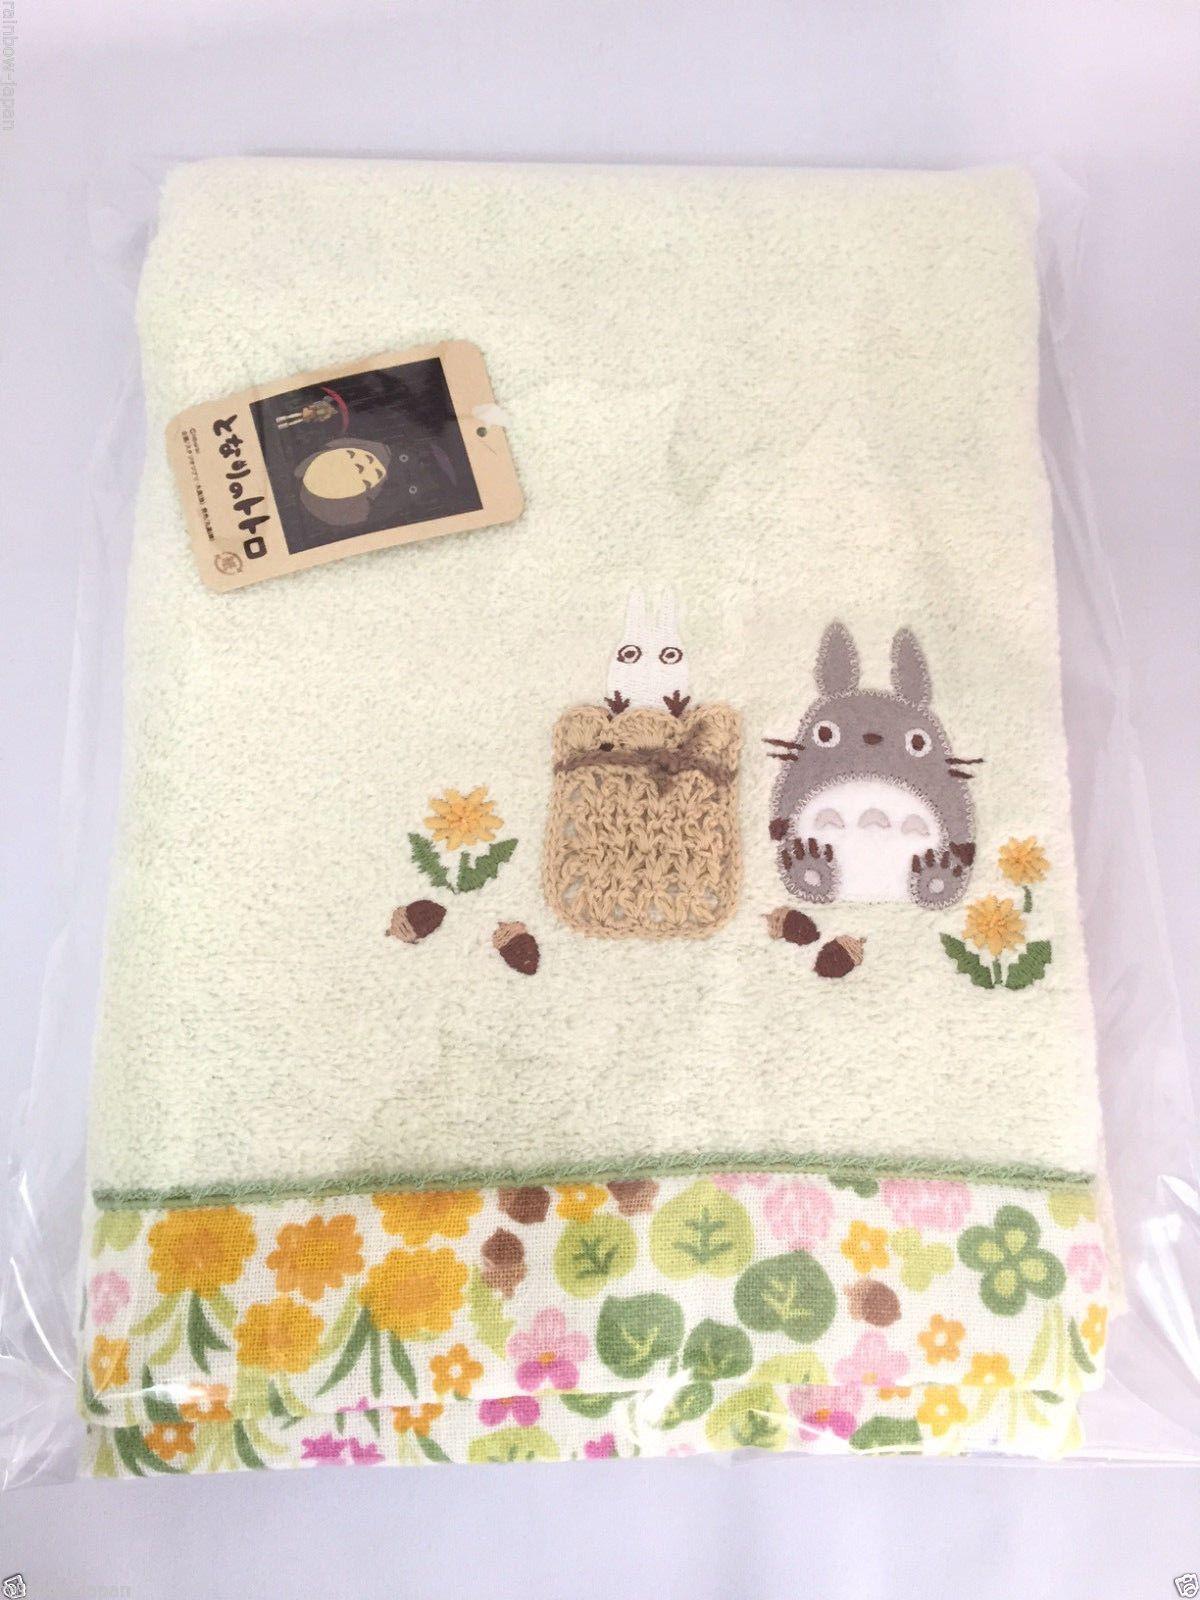 My Neighbor Totoro Bath Towel 120 x 60cm 03311 Cotton 100% Studio Ghibli Japan